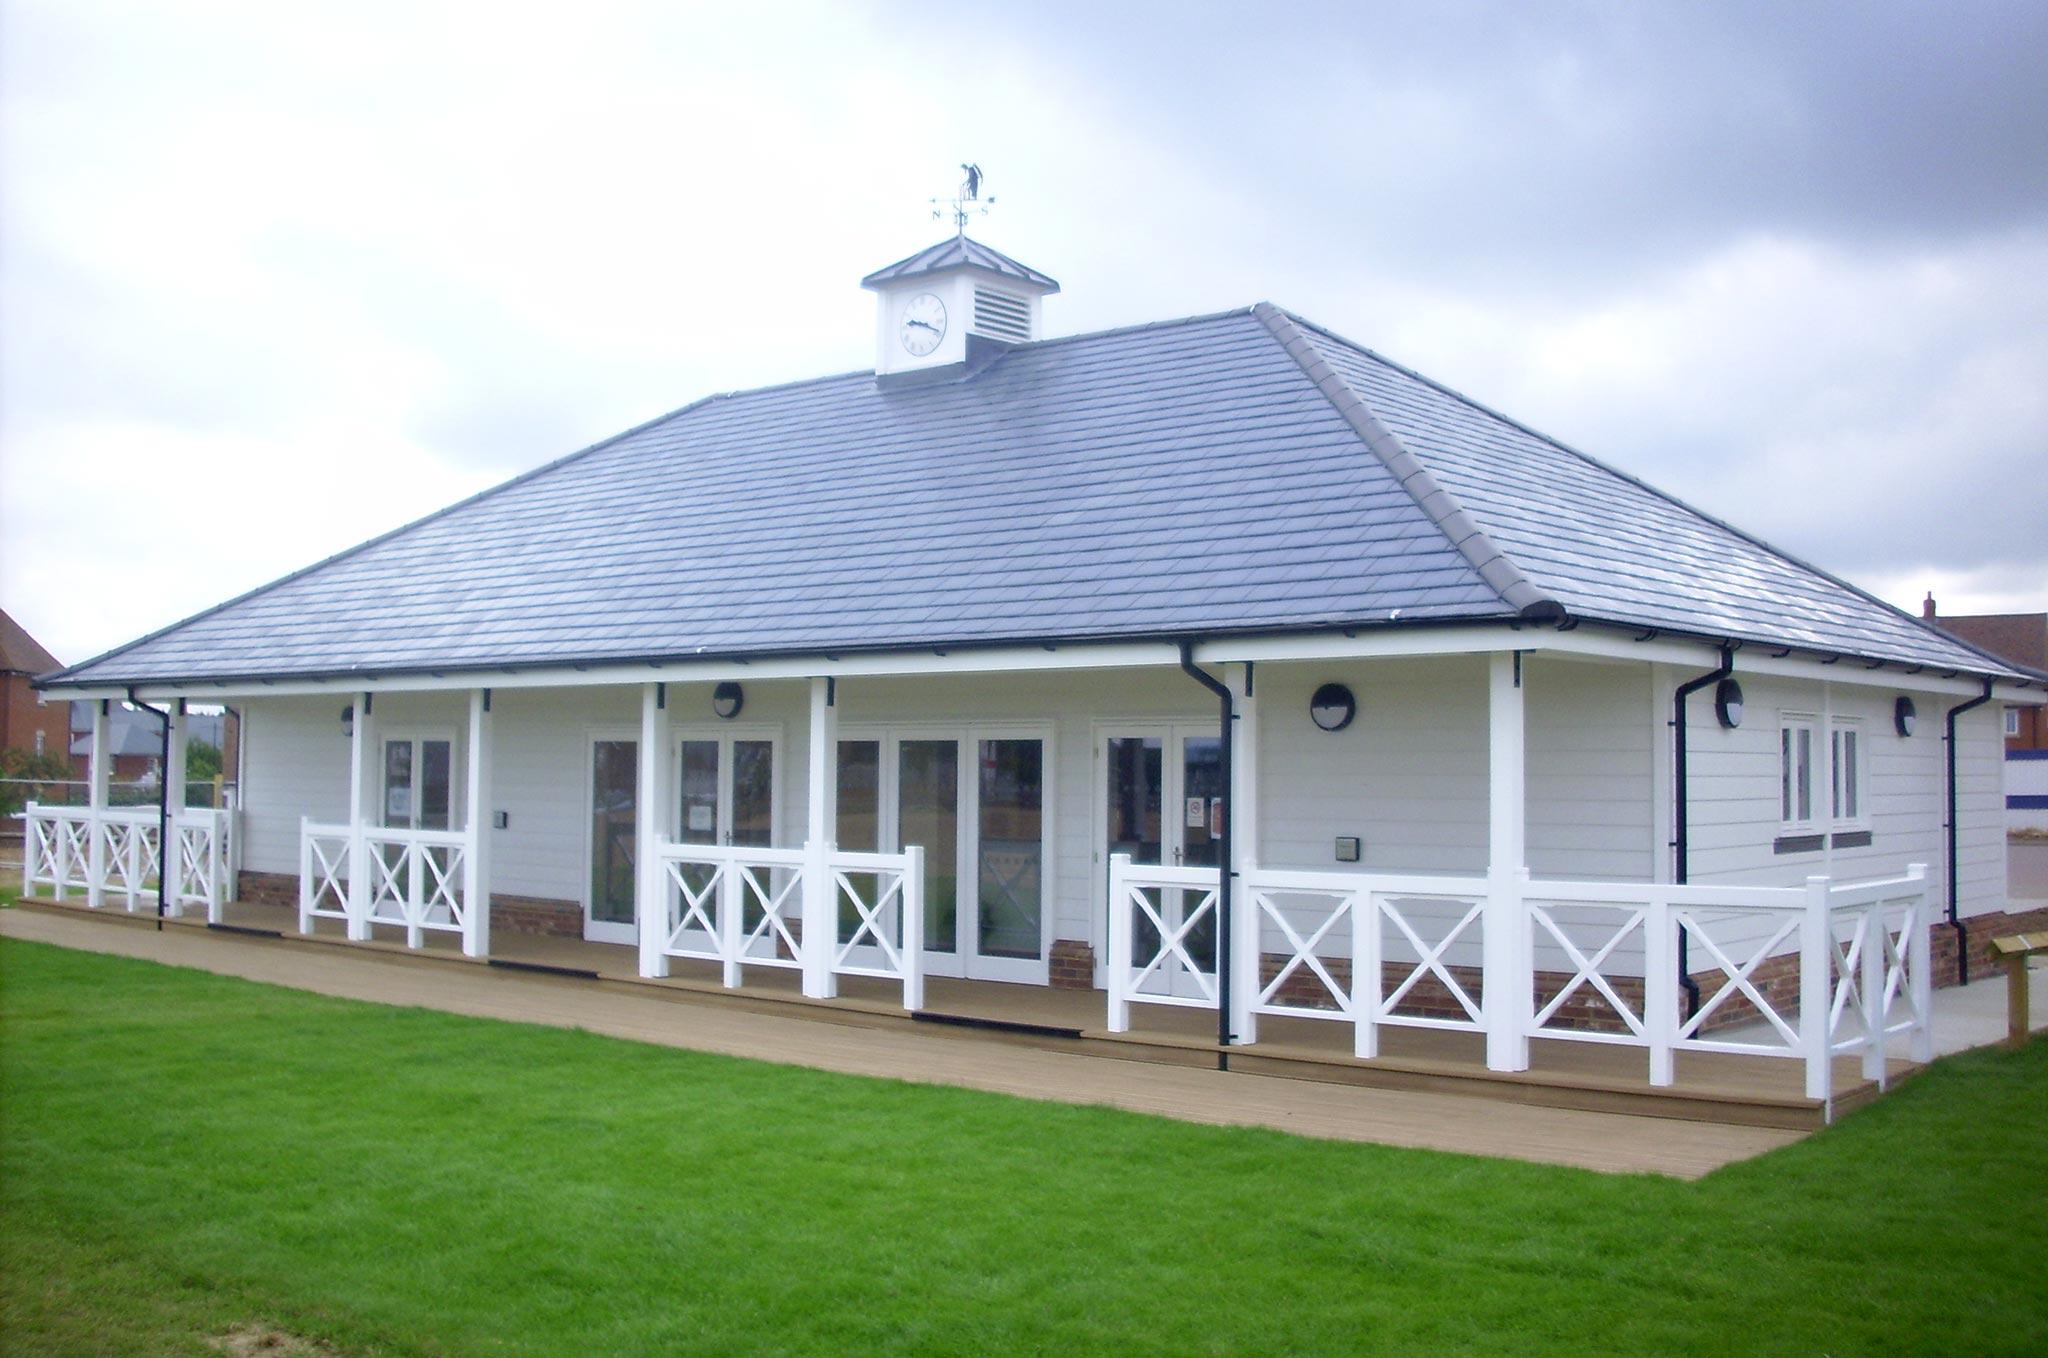 Cricket Pavilion Kings Hill Strata Construction Group Ltd